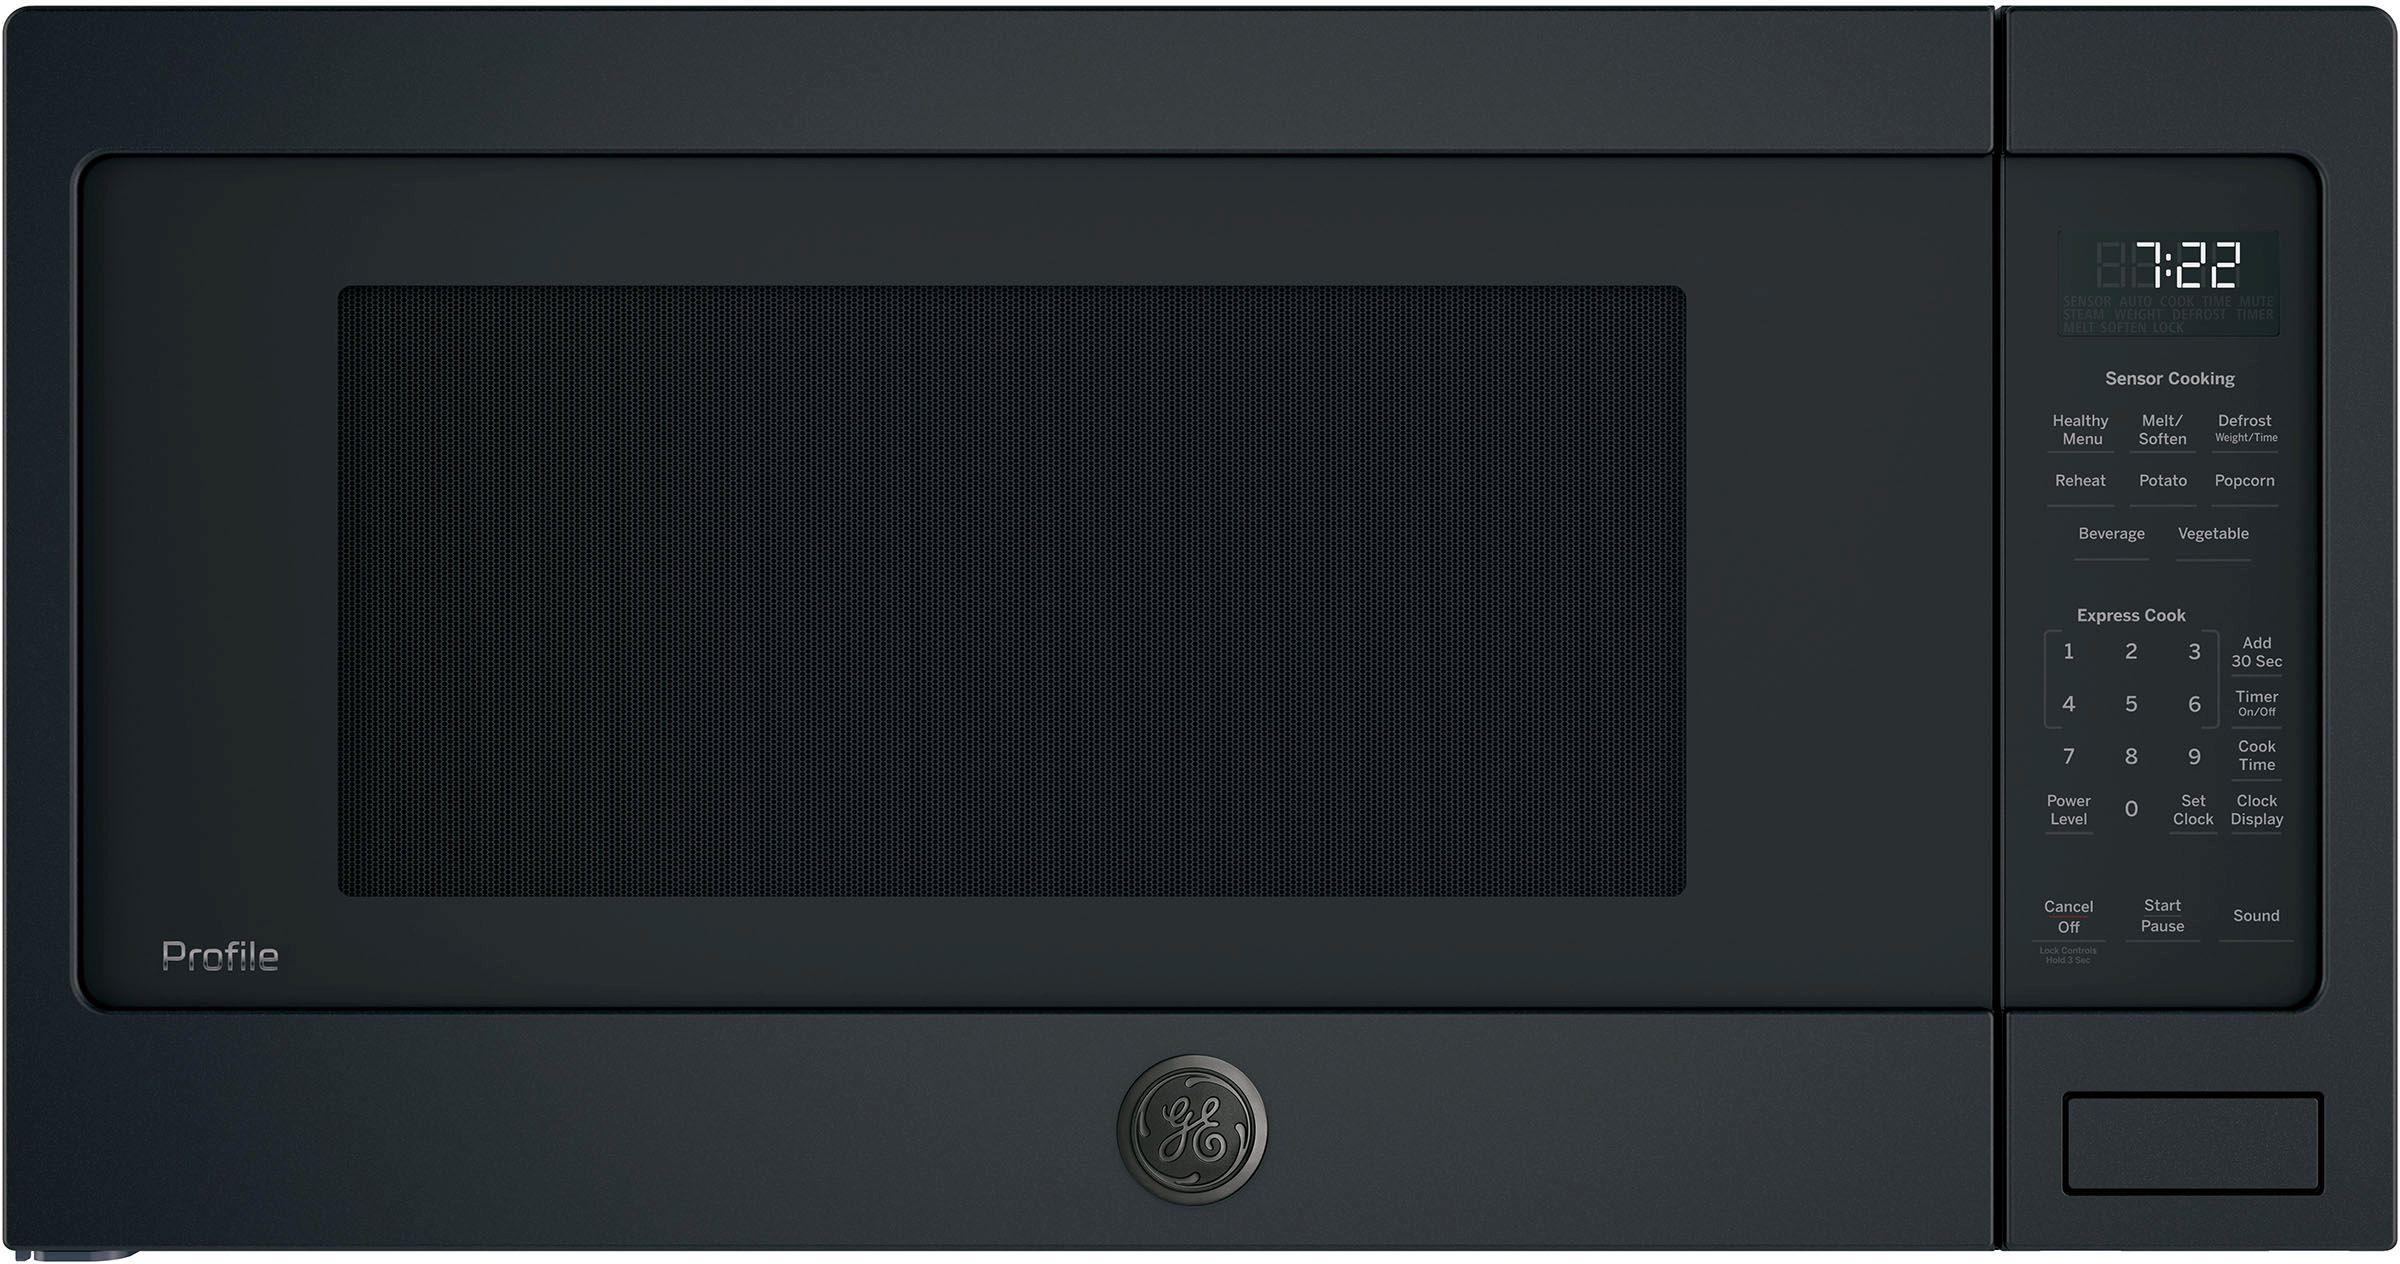 Ge Profile Series Countertop Sensor Microwave Oven Black Slate Pes7227fmds